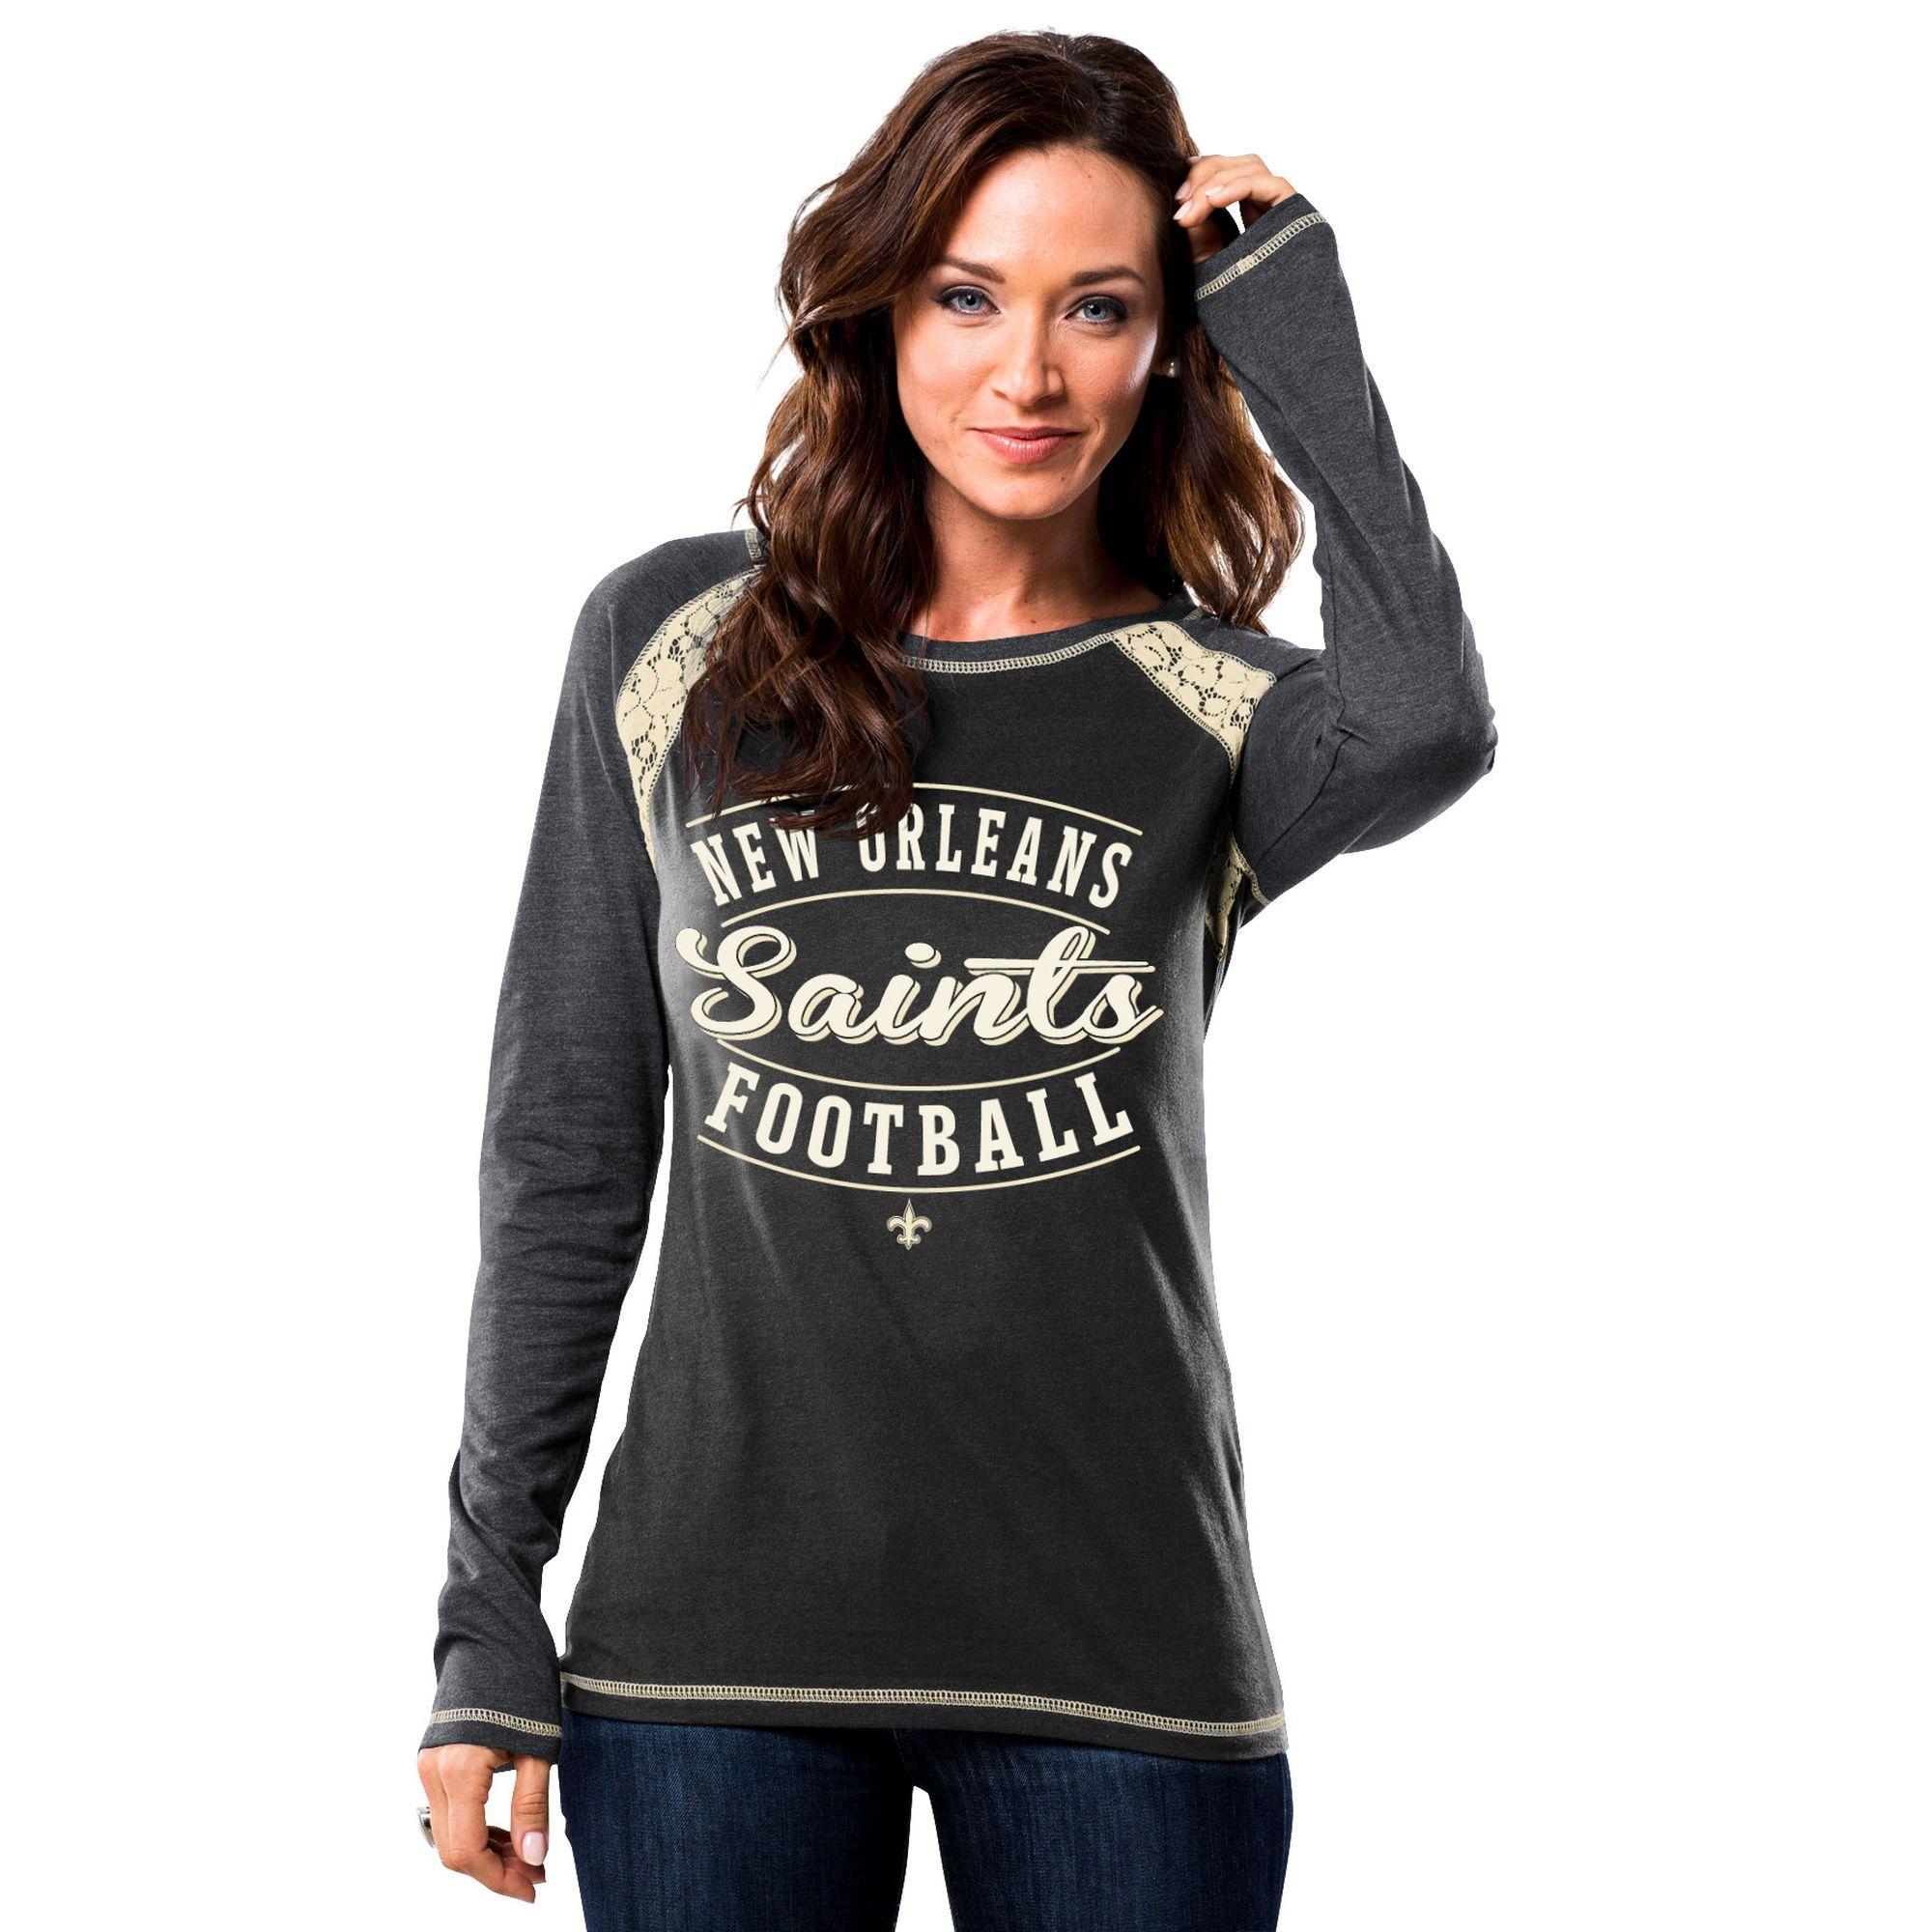 New Orleans Saints Majestic Women's Fantasy League Long Sleeve T-Shirt - Black/Gray